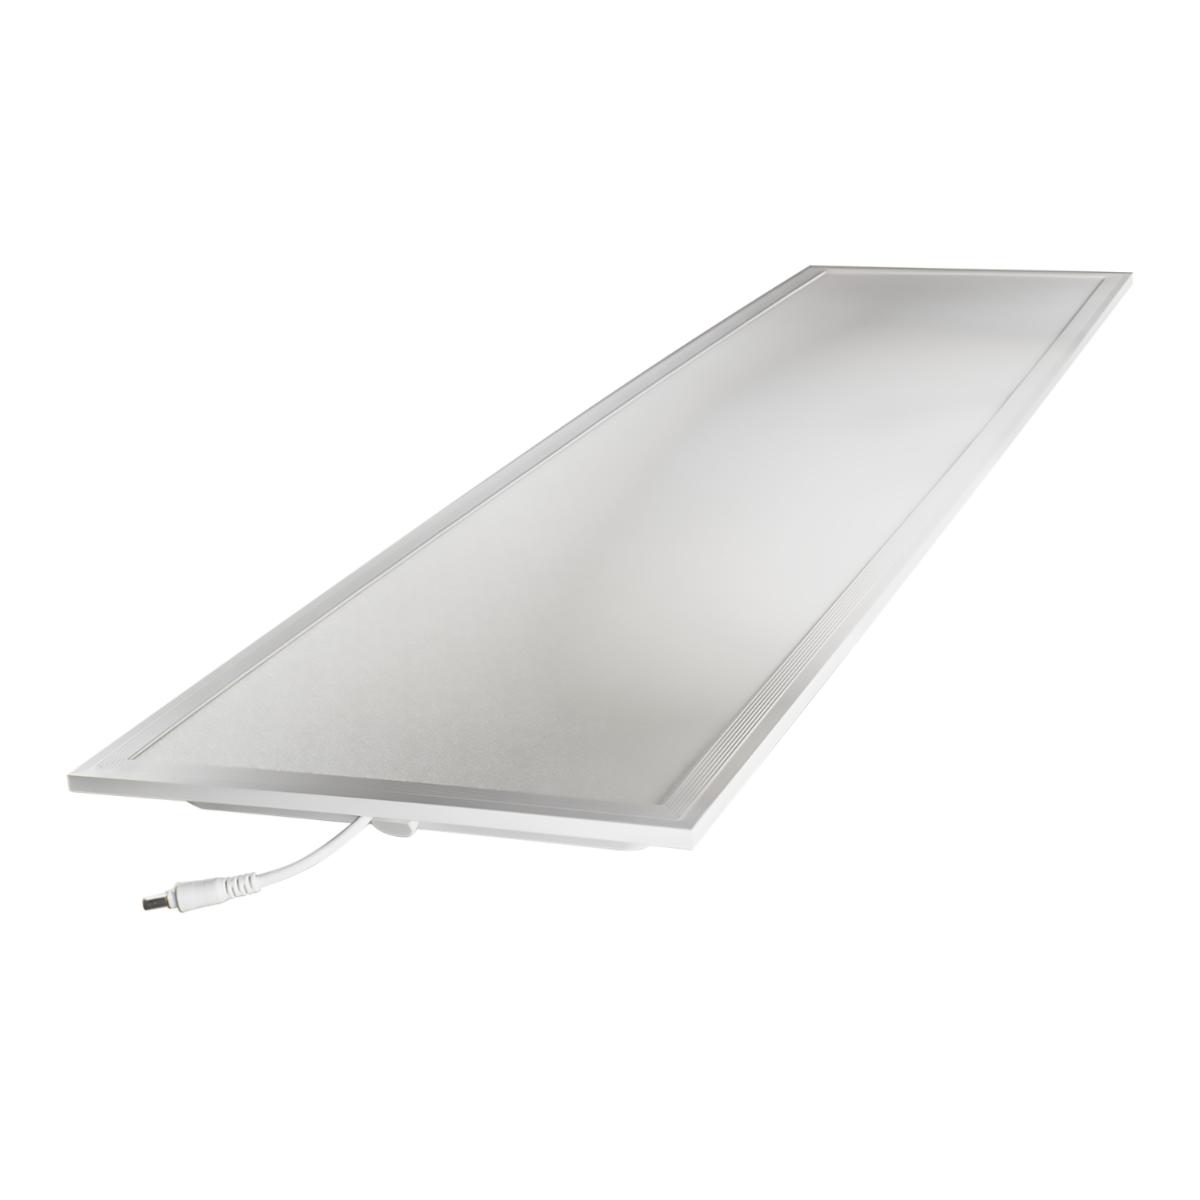 Noxion Panel LED Delta Pro Highlum V2.0 Xitanium DALI 40W 30x120cm 3000K 5280lm UGR <19   Dali Regulable - Luz Cálida - Reemplazo 2x36W